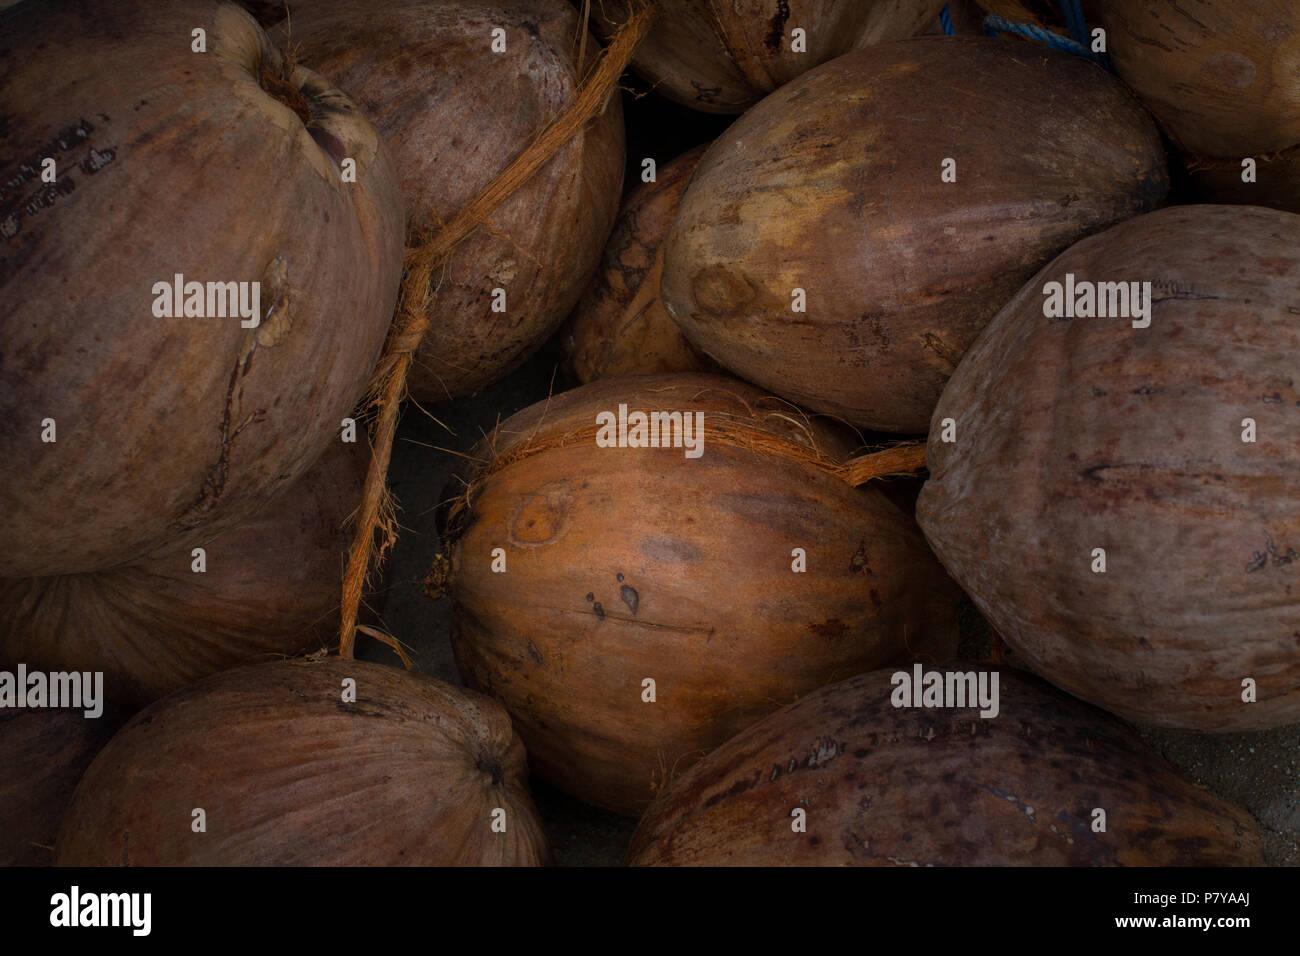 Coconuts Market Stock Photos & Coconuts Market Stock Images